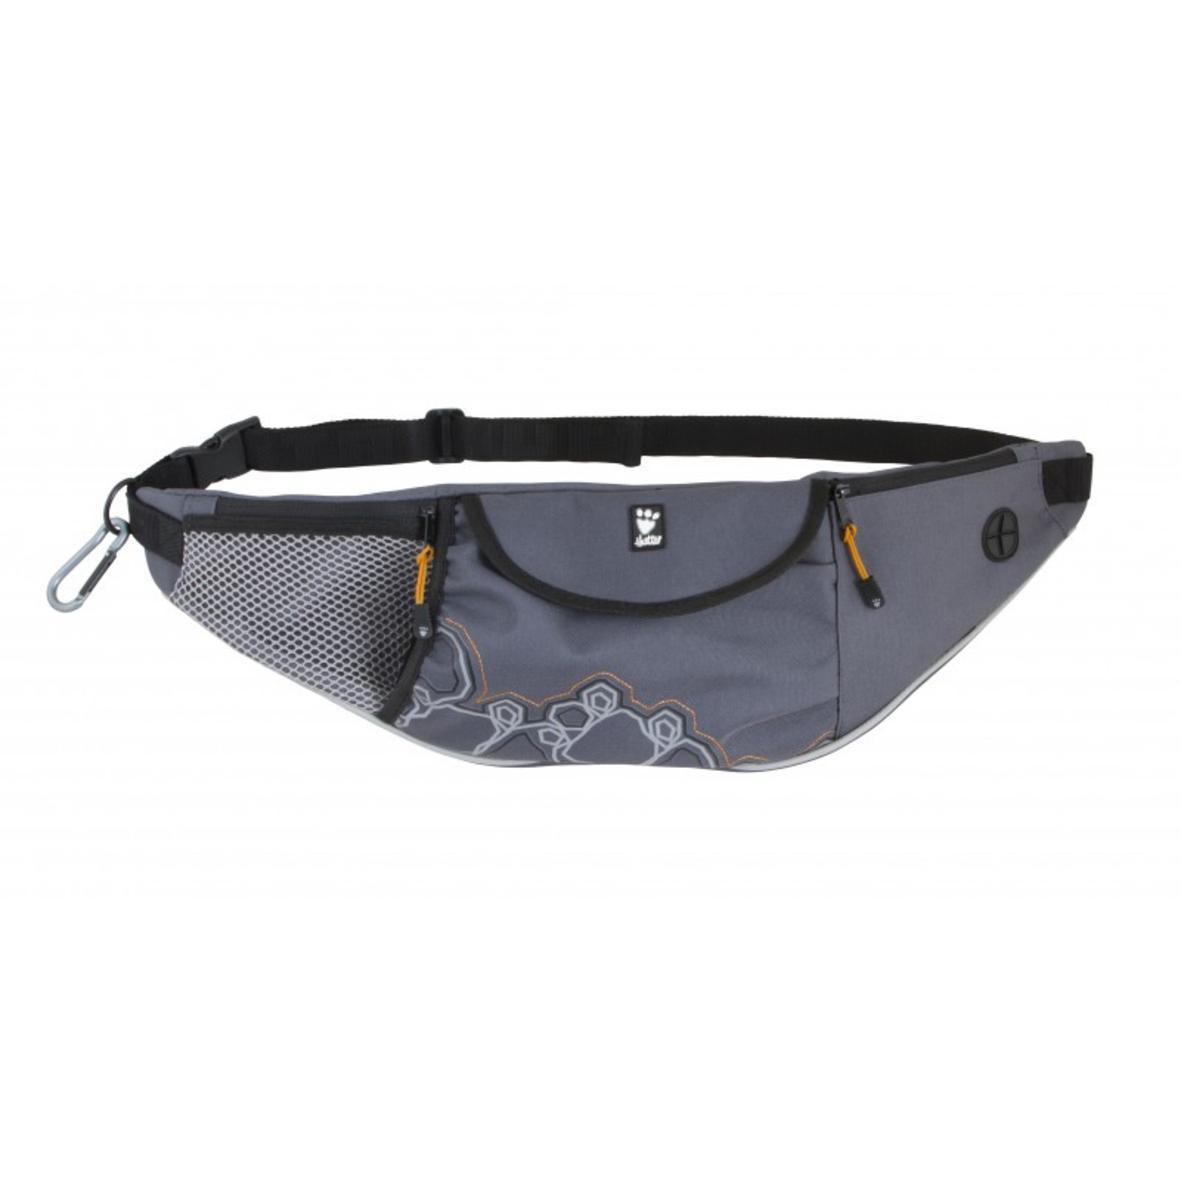 (D) Hurtta Outdoors Action Belt Bag Granite